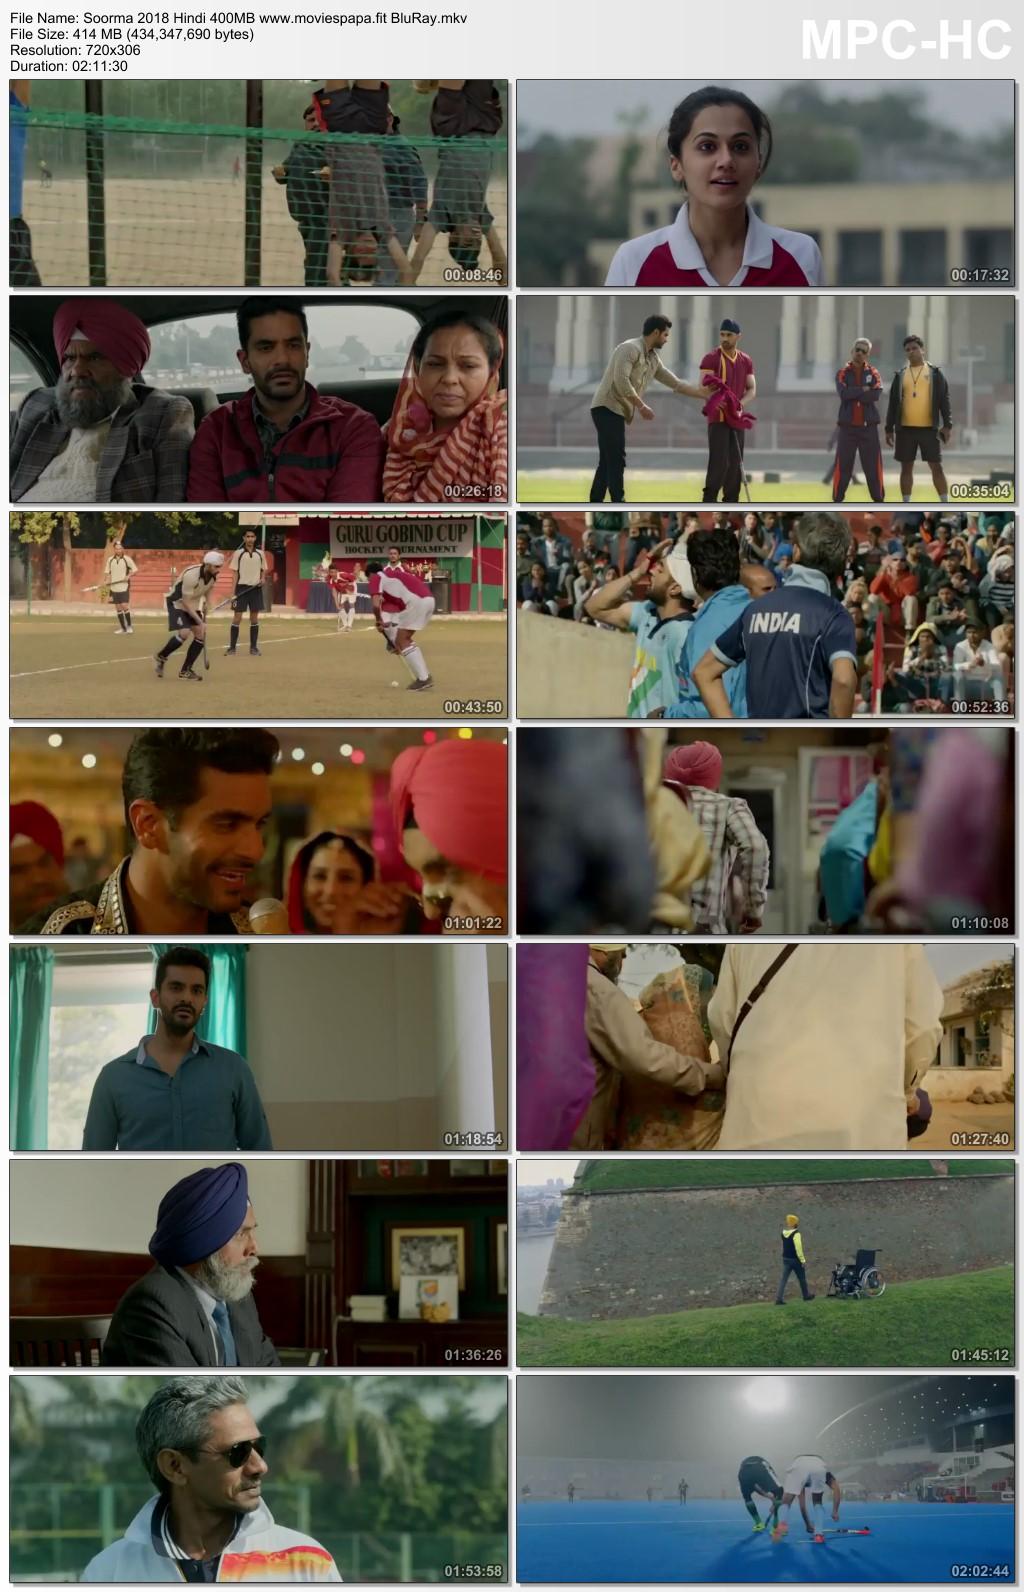 Soorma 2018 Hindi Movie 450MB BluRay Download